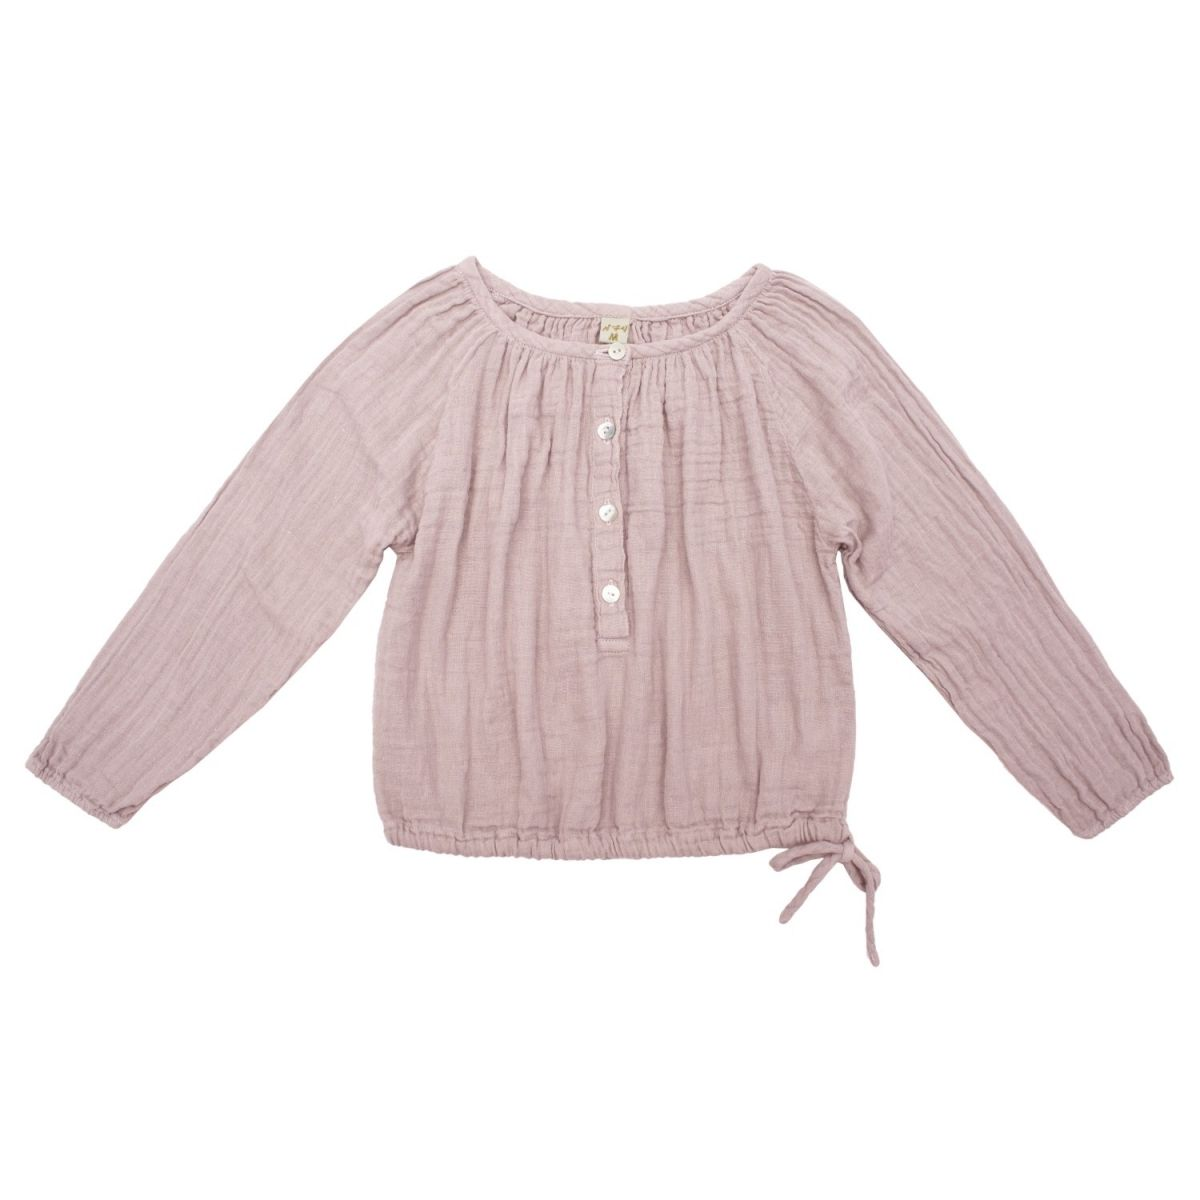 Bluzka Naia zgaszony róż - Numero 74